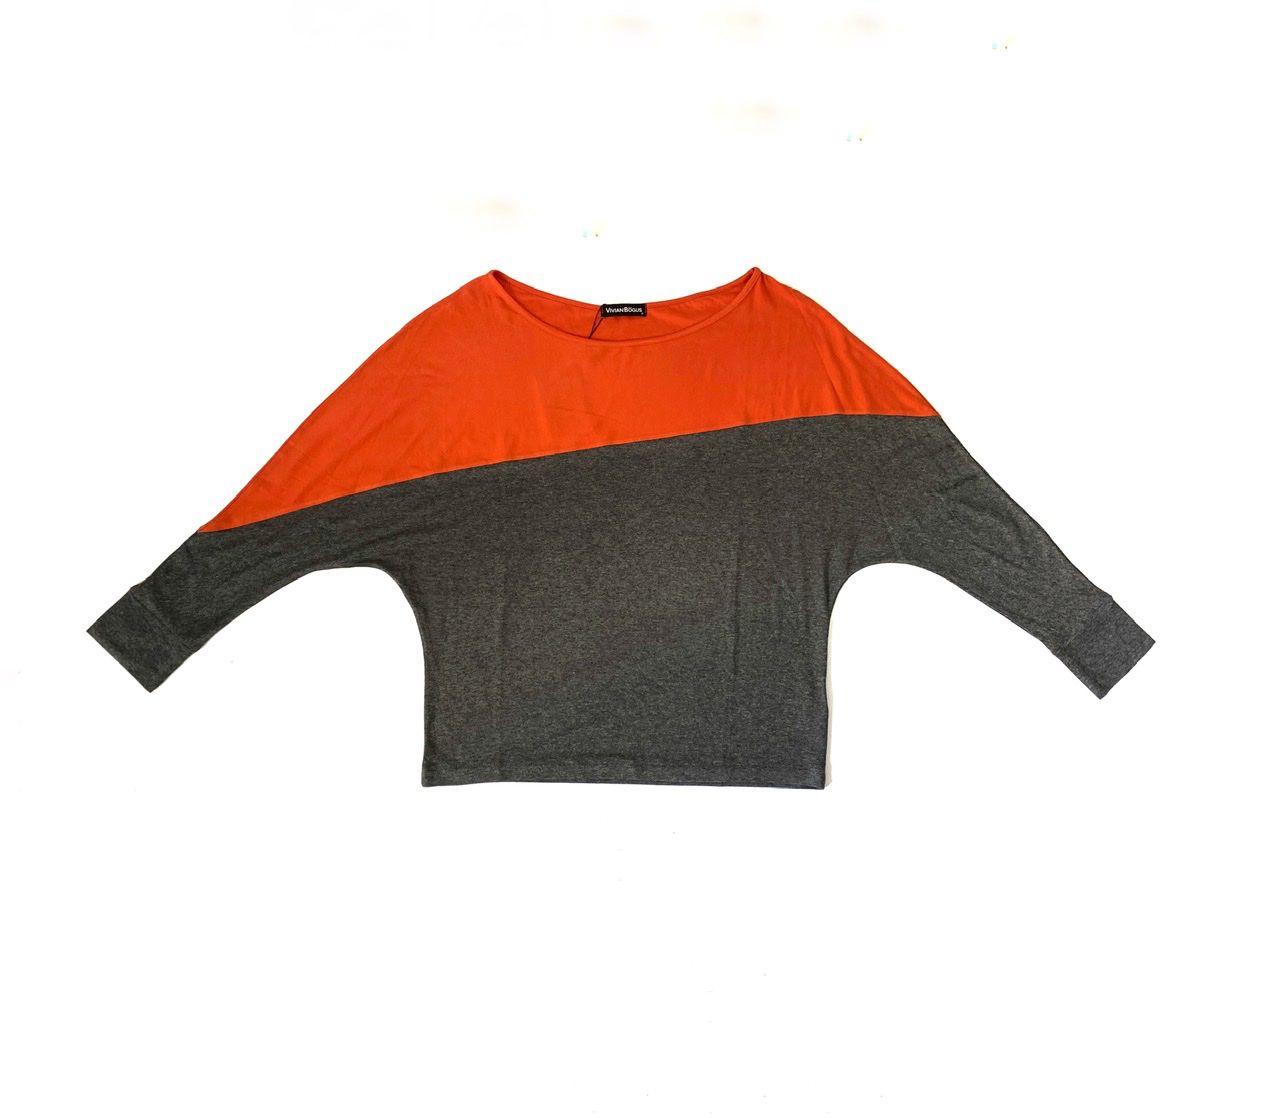 Blusa bicolor morcego laranja e mescla em malha   - Vivian Bógus